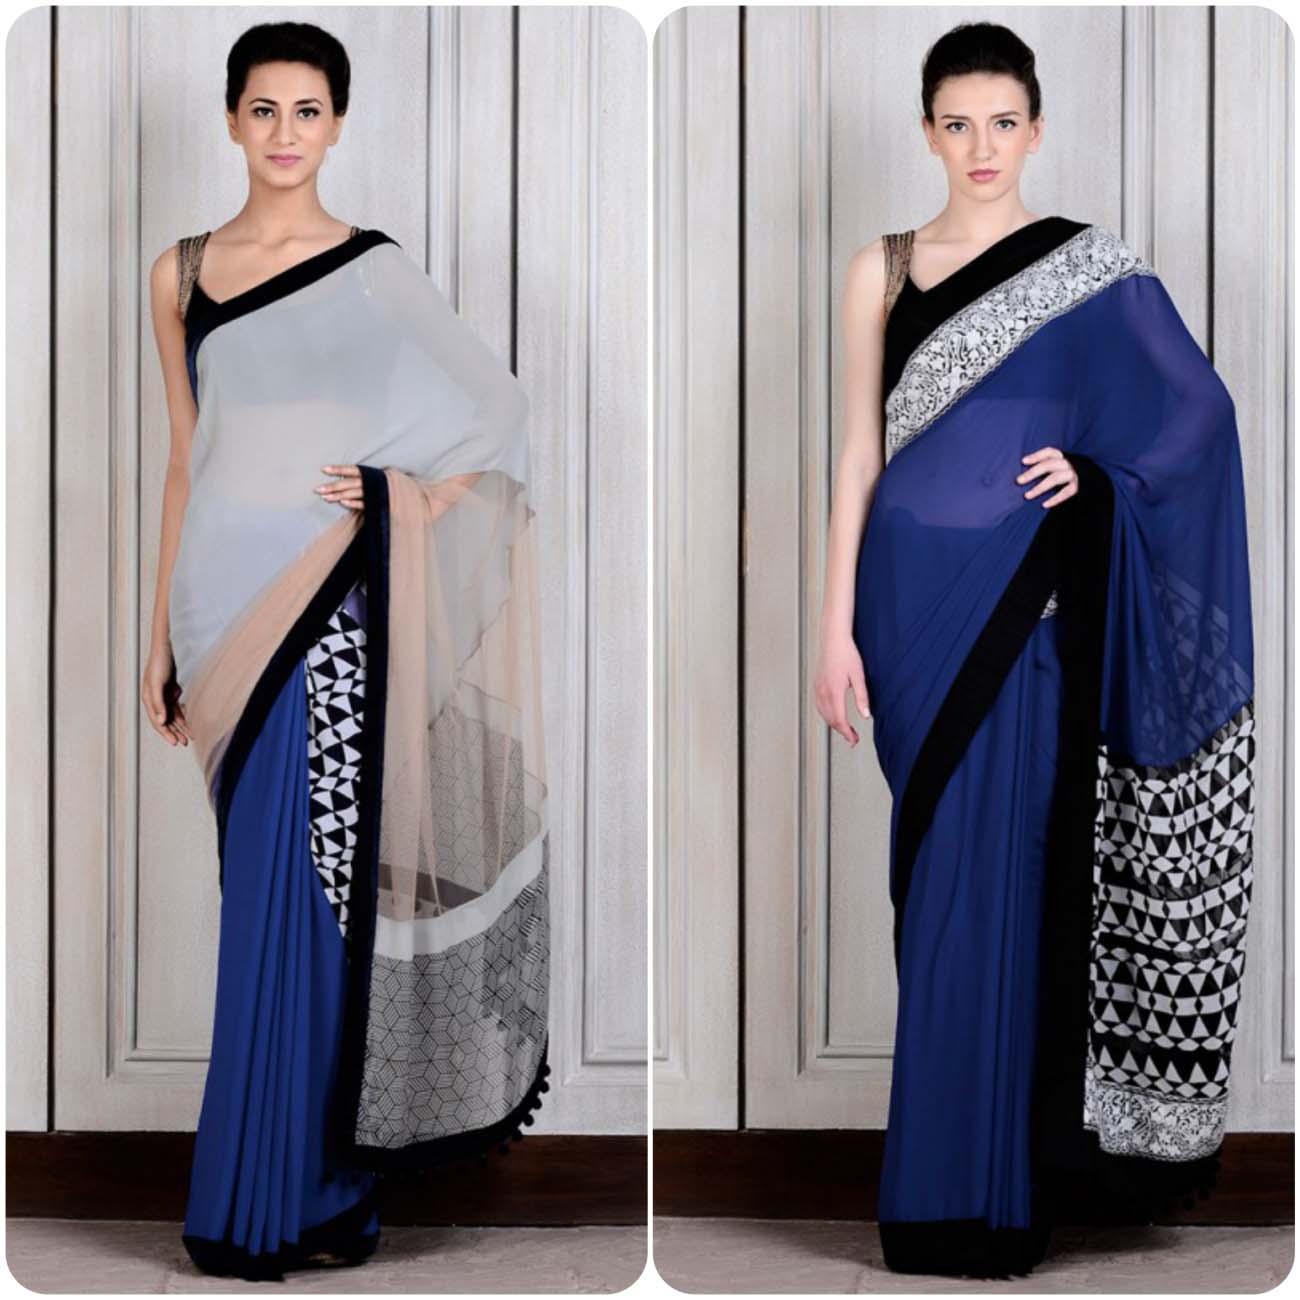 Manish Malhotra Designers Saree Collection 2016-2017...styloplanet (25)